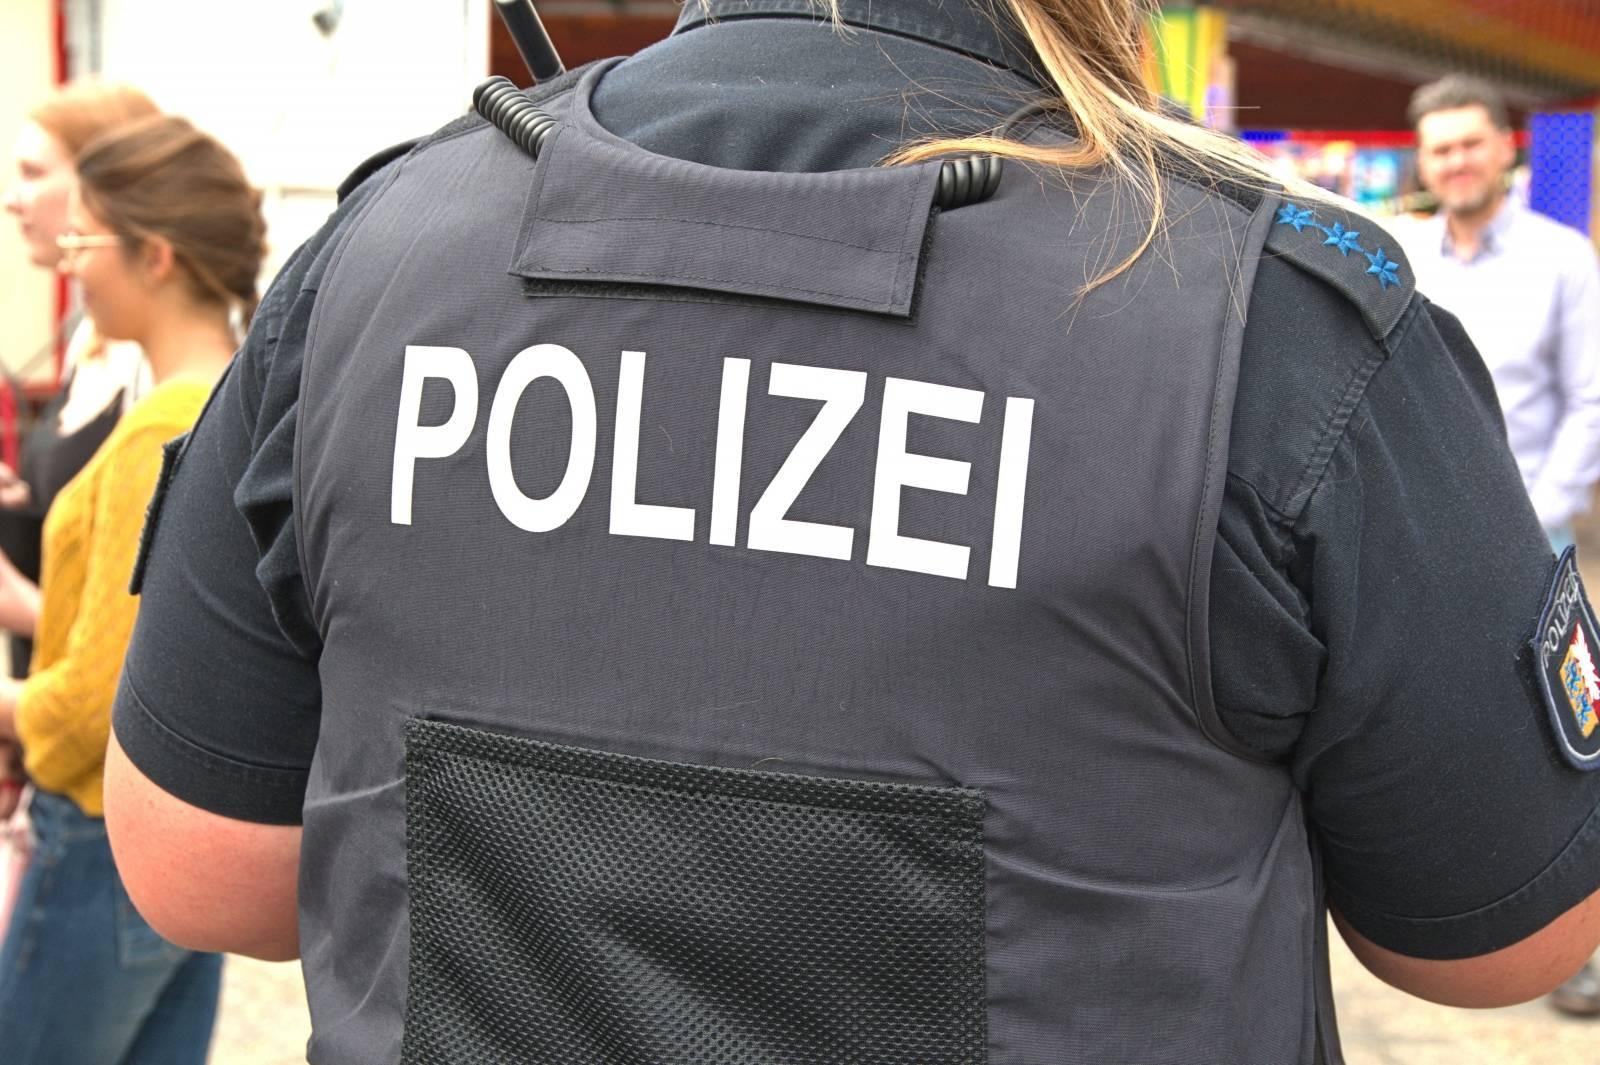 The 421st peer market in Schleswig